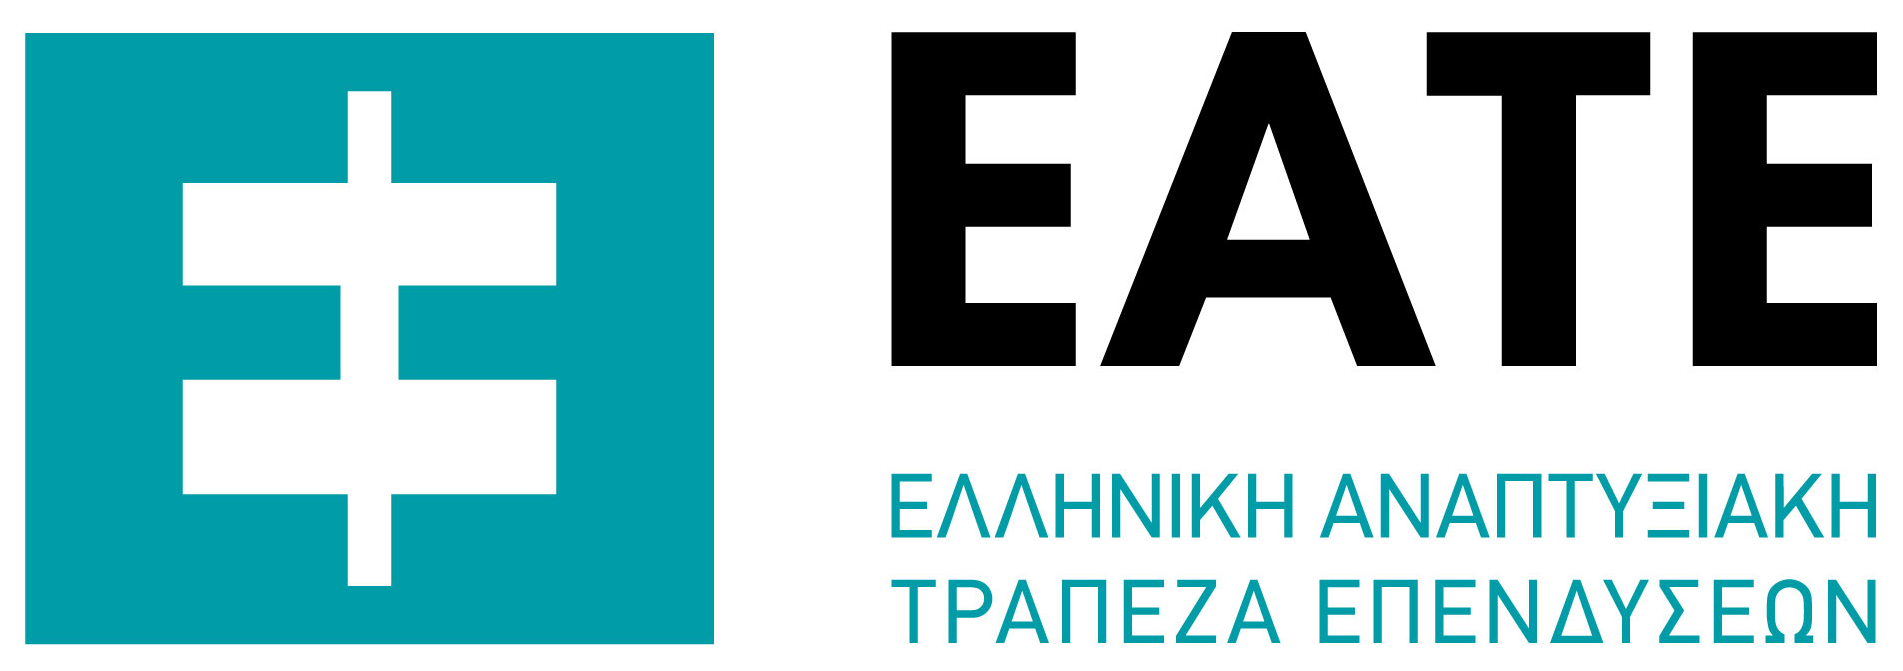 EuSIF: Το πρώτο «πράσινο» fund με τη συμμετοχή της Ελληνικής Αναπτυξιακής Τράπεζας Επενδύσεων